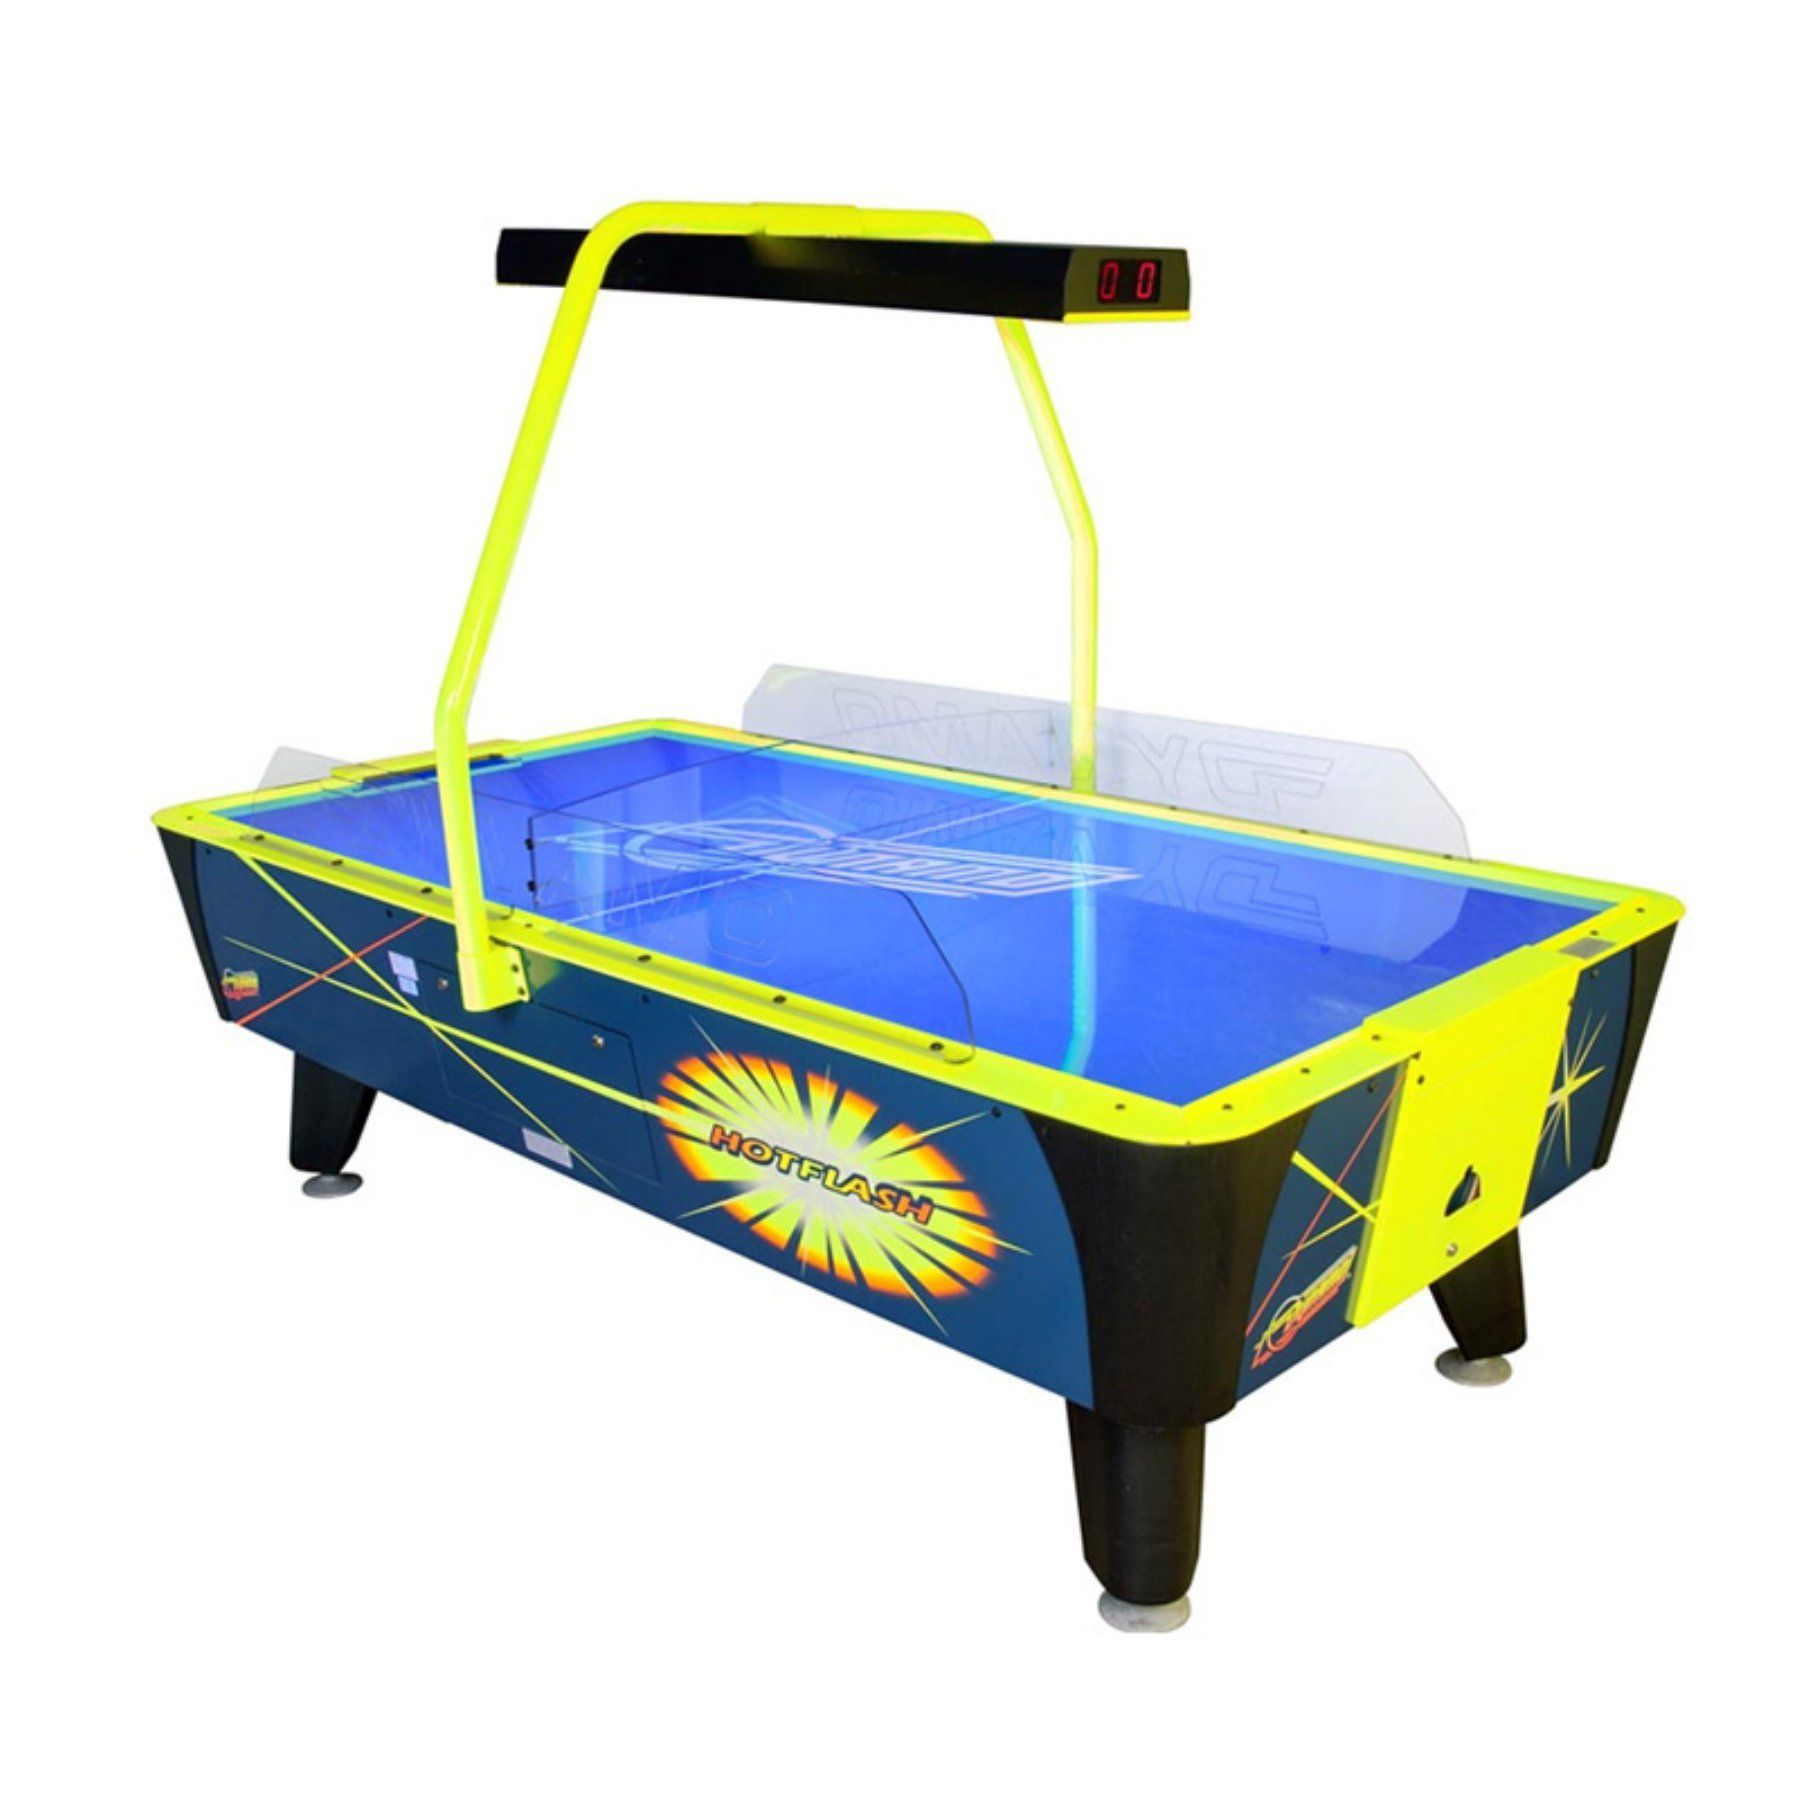 Dynamo 8 Ft Hot Flash Ii Air Hockey Table Hot Flash Ii Air Hockey Air Hockey Air Hockey Table Air Hockey Tables